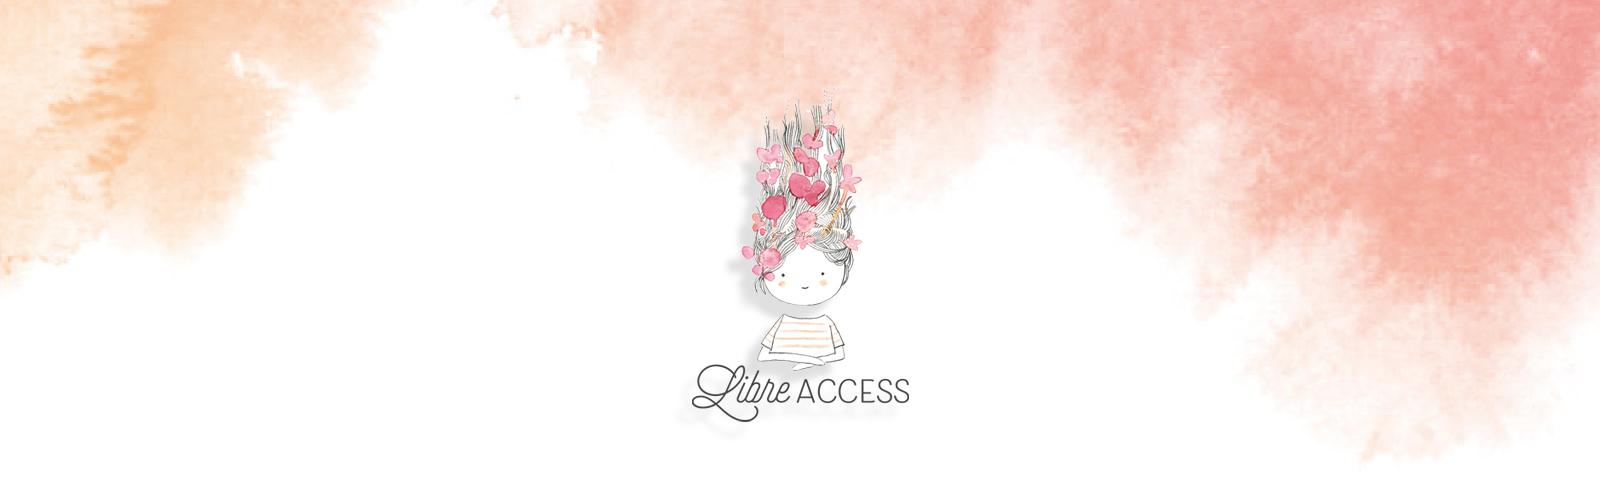 bars libre access consciousness pnl relaxation detente bien etre therapie montamise poitiers chatellerault